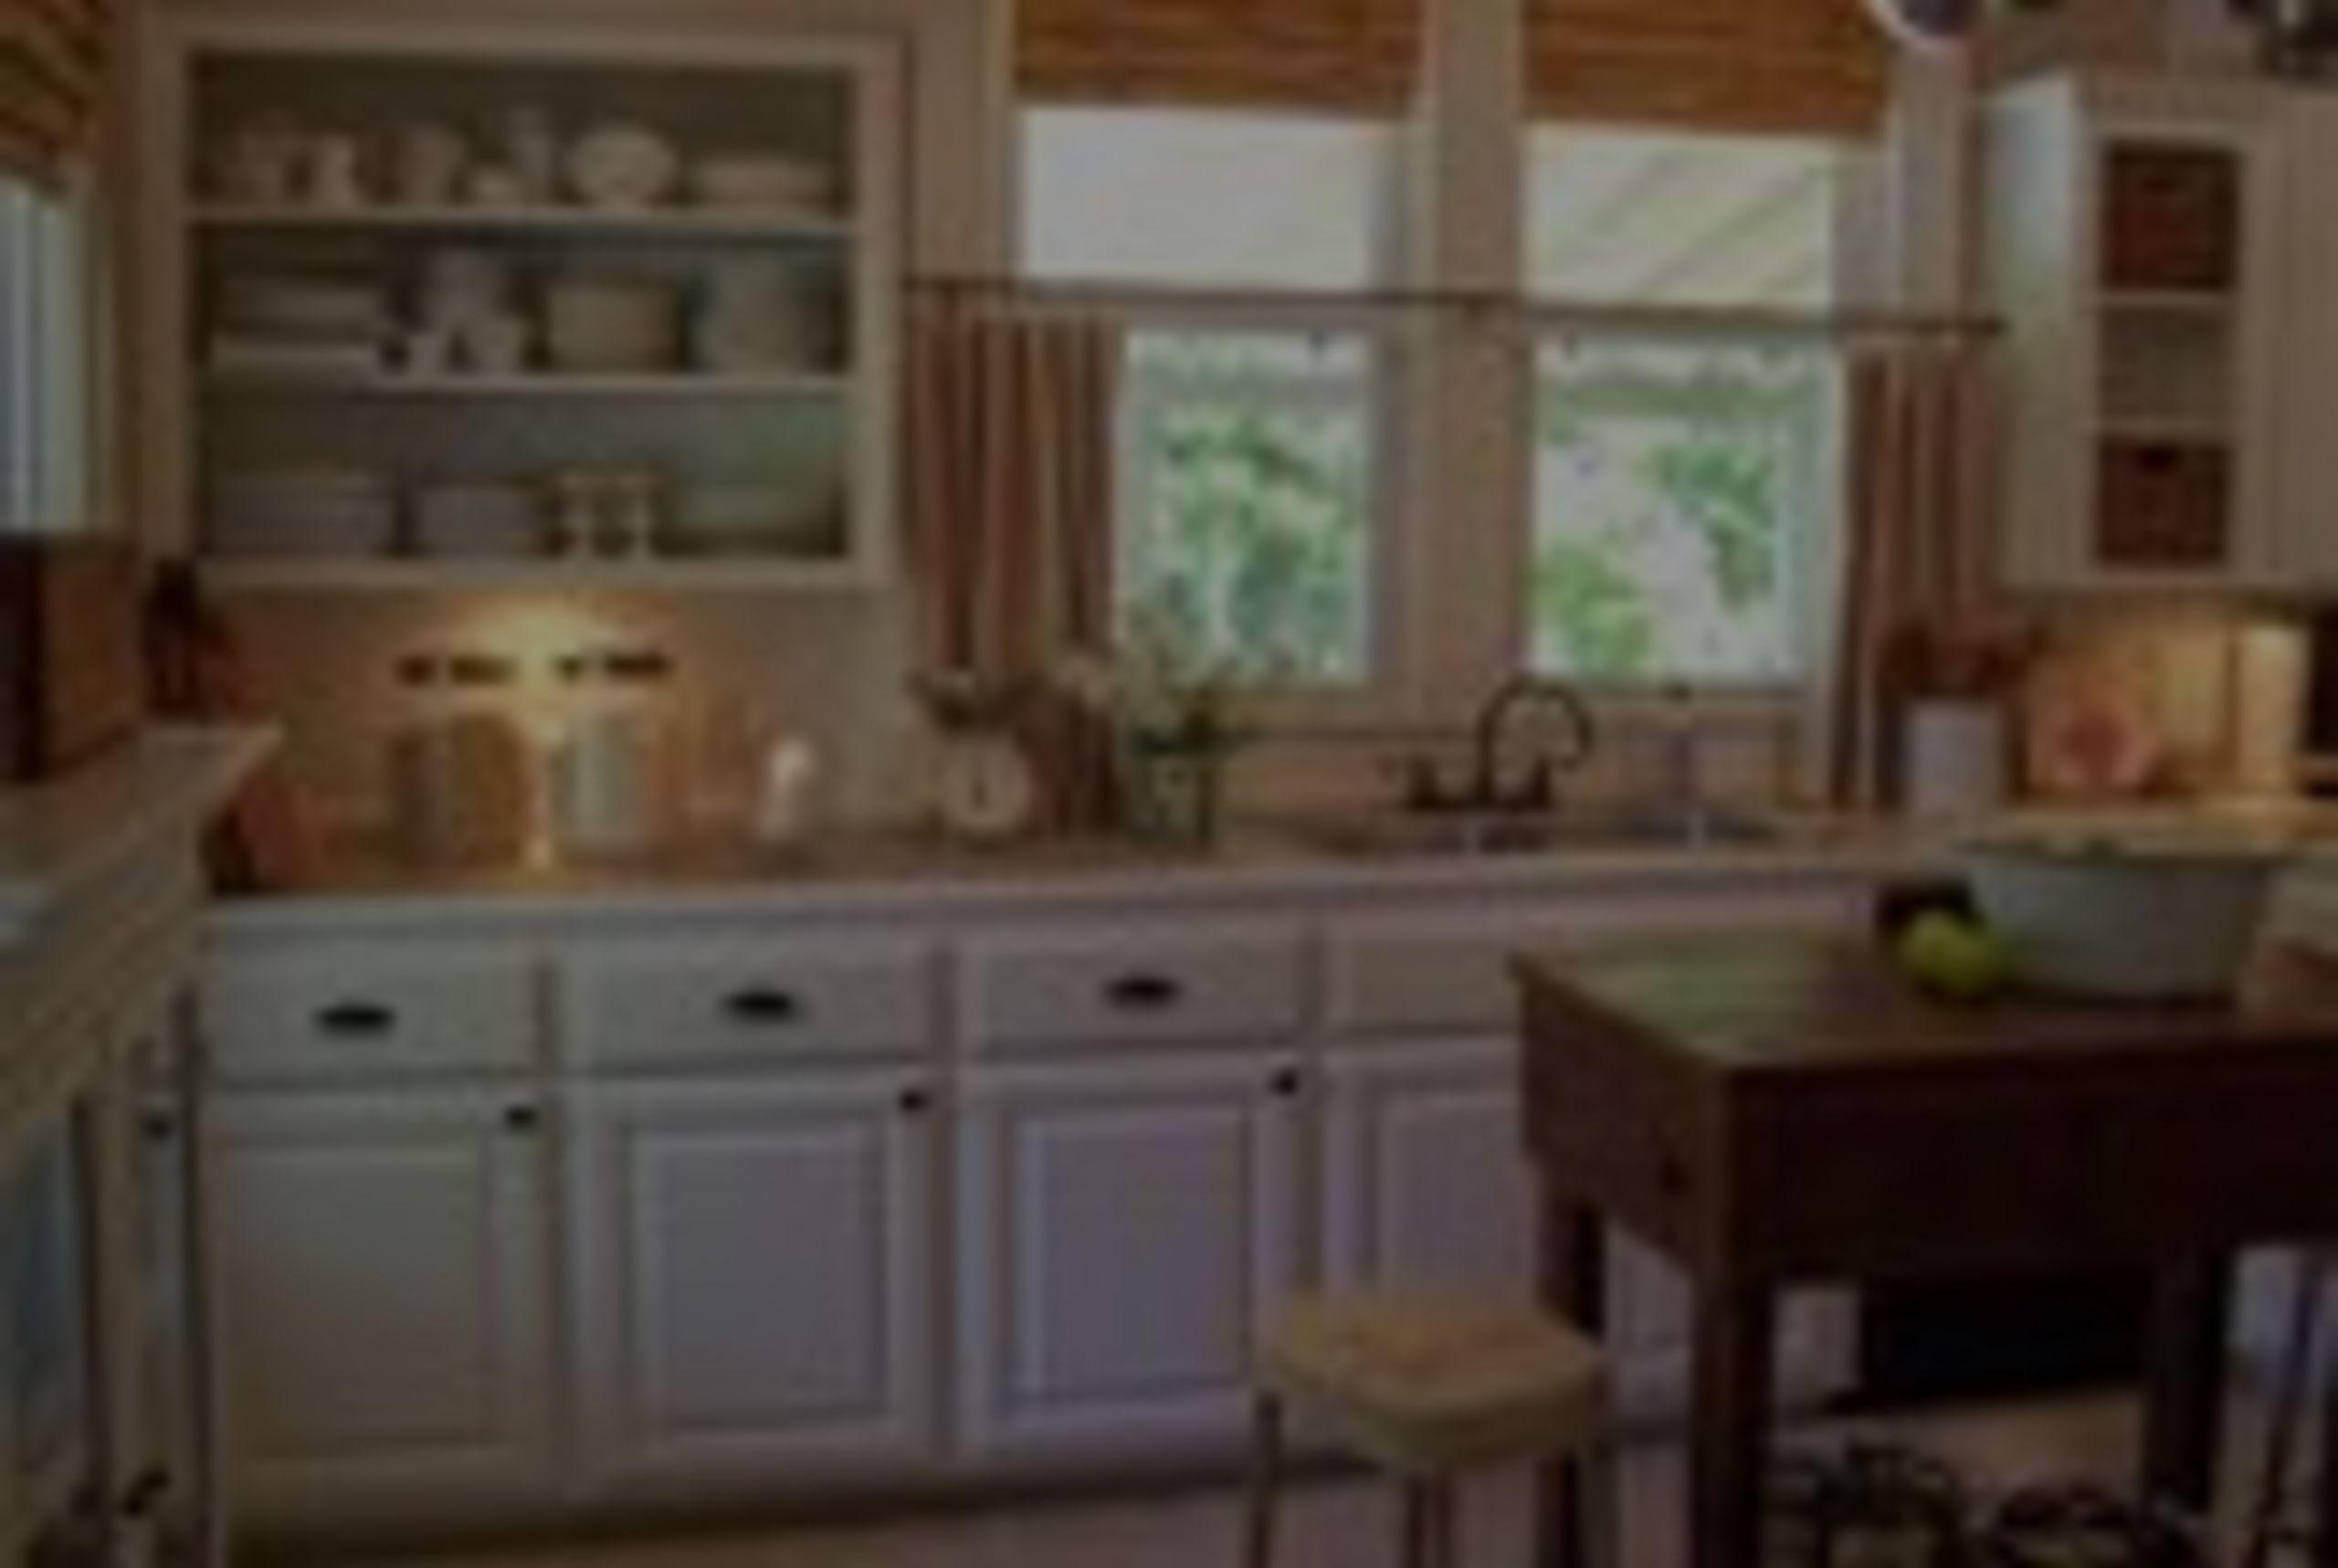 Budget Kitchen Remodeling: 5 Money-Saving Steps